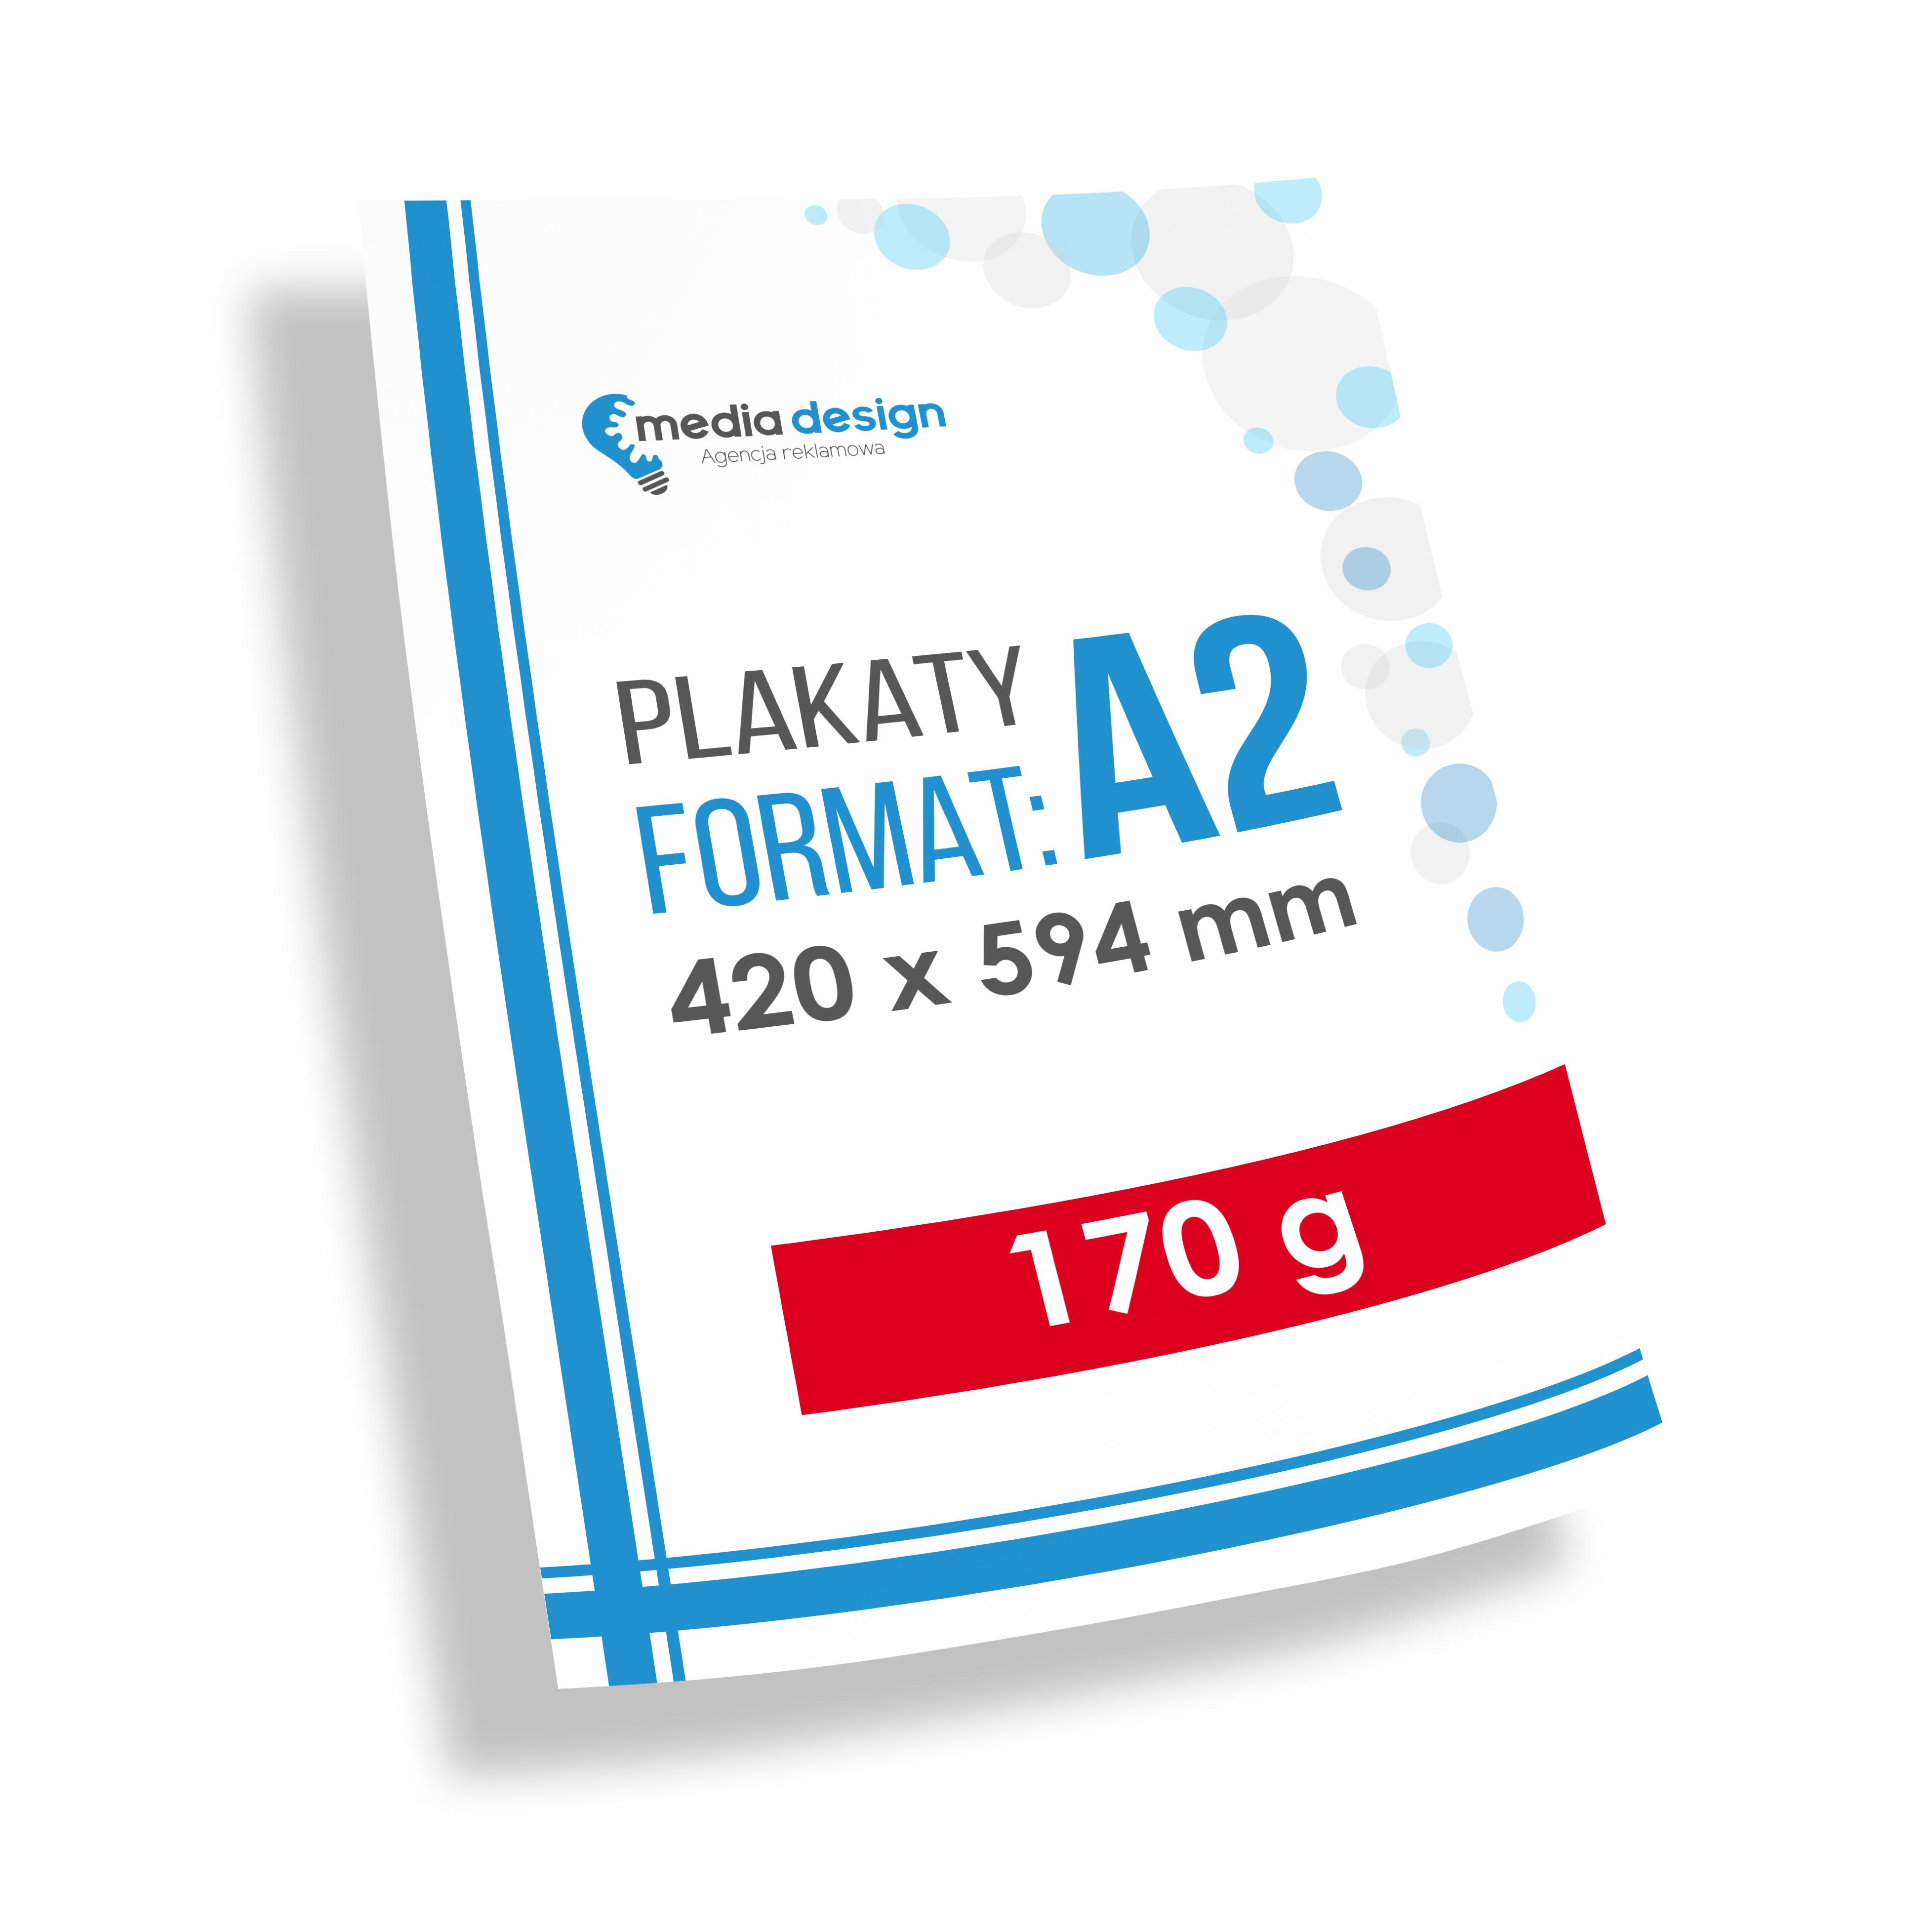 Plakaty A2 (420x594 mm) - 170g